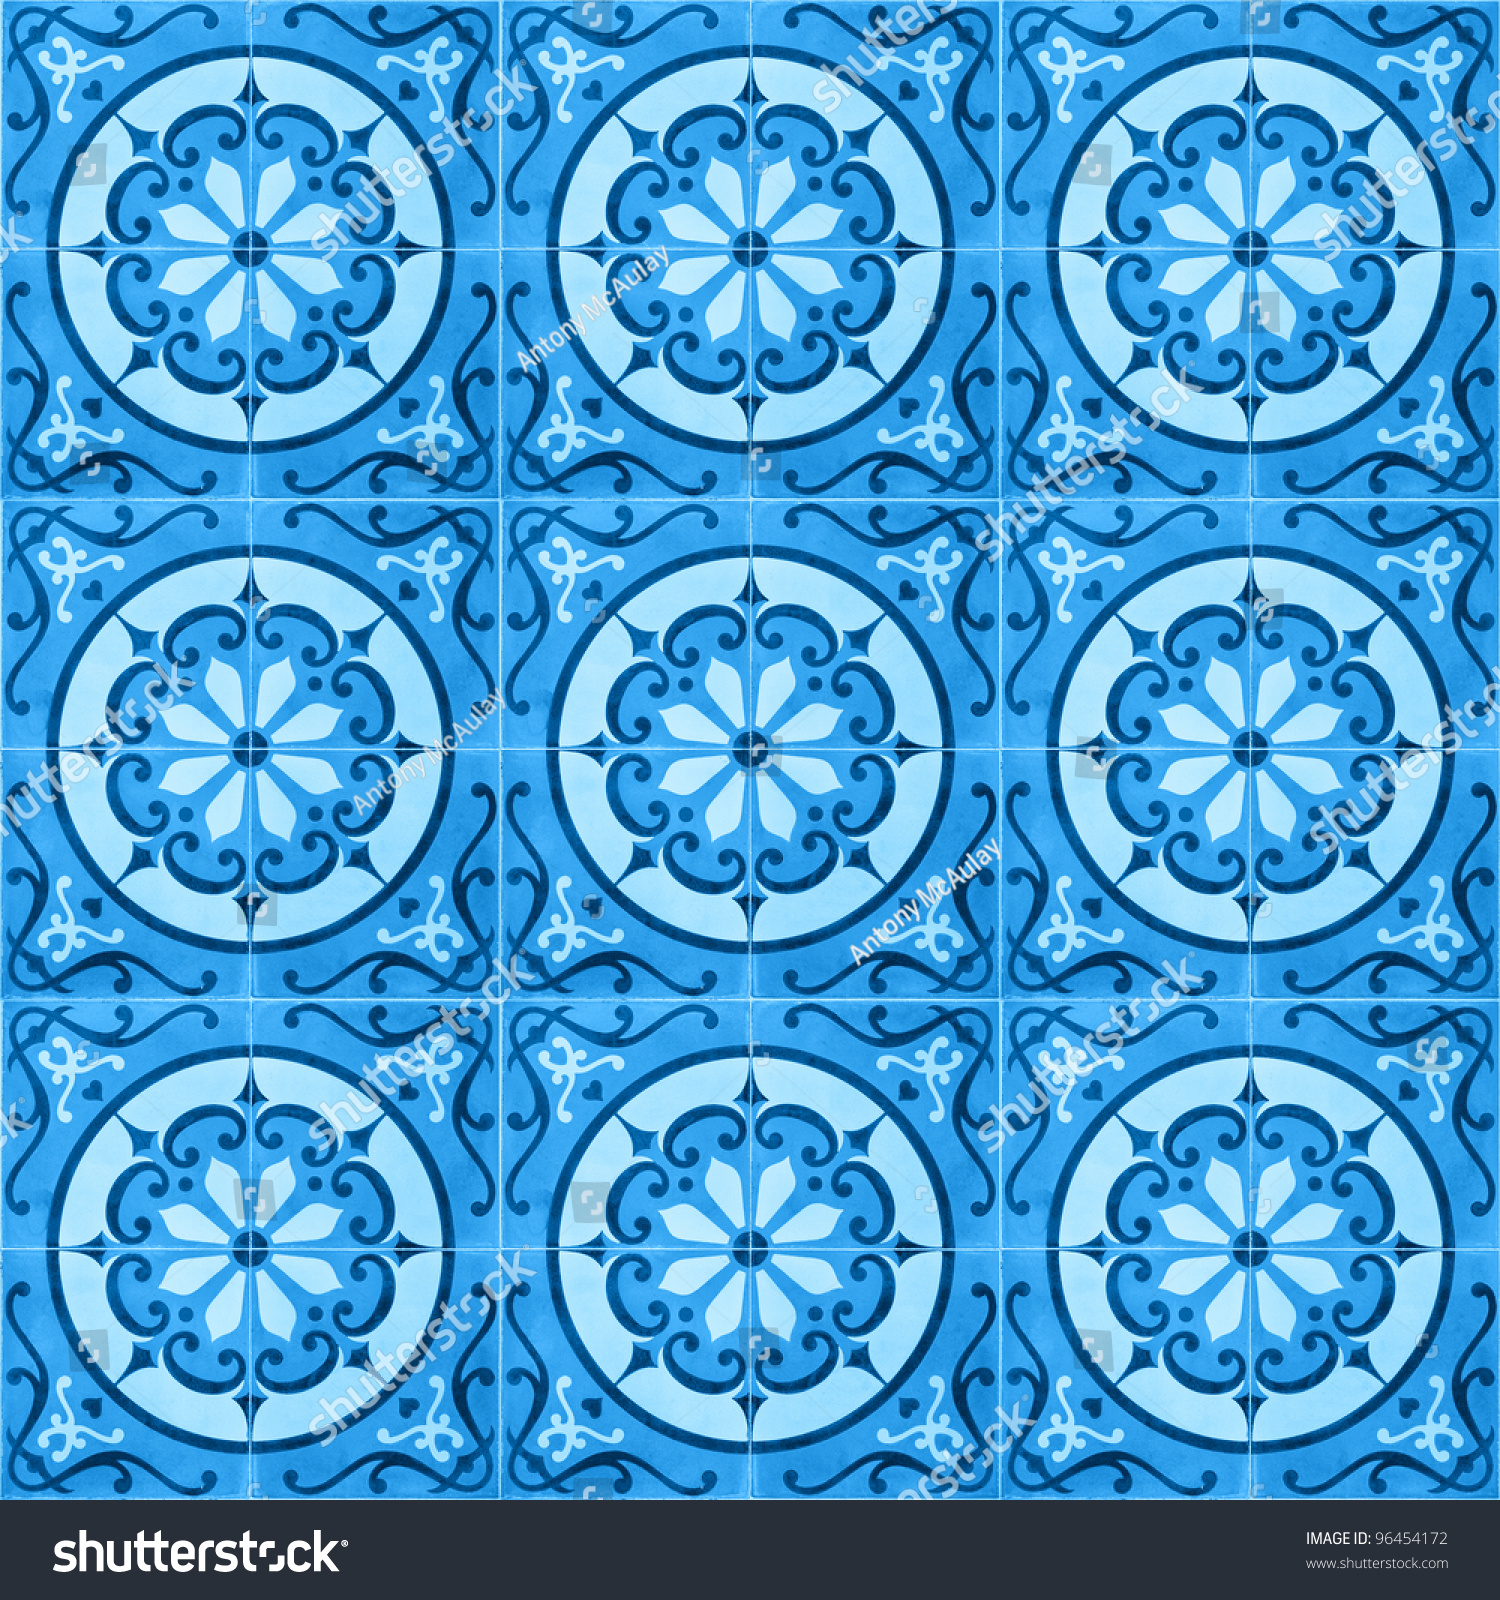 Seamless Background Image Patterned Ceramic Tiles Stock Photo ...